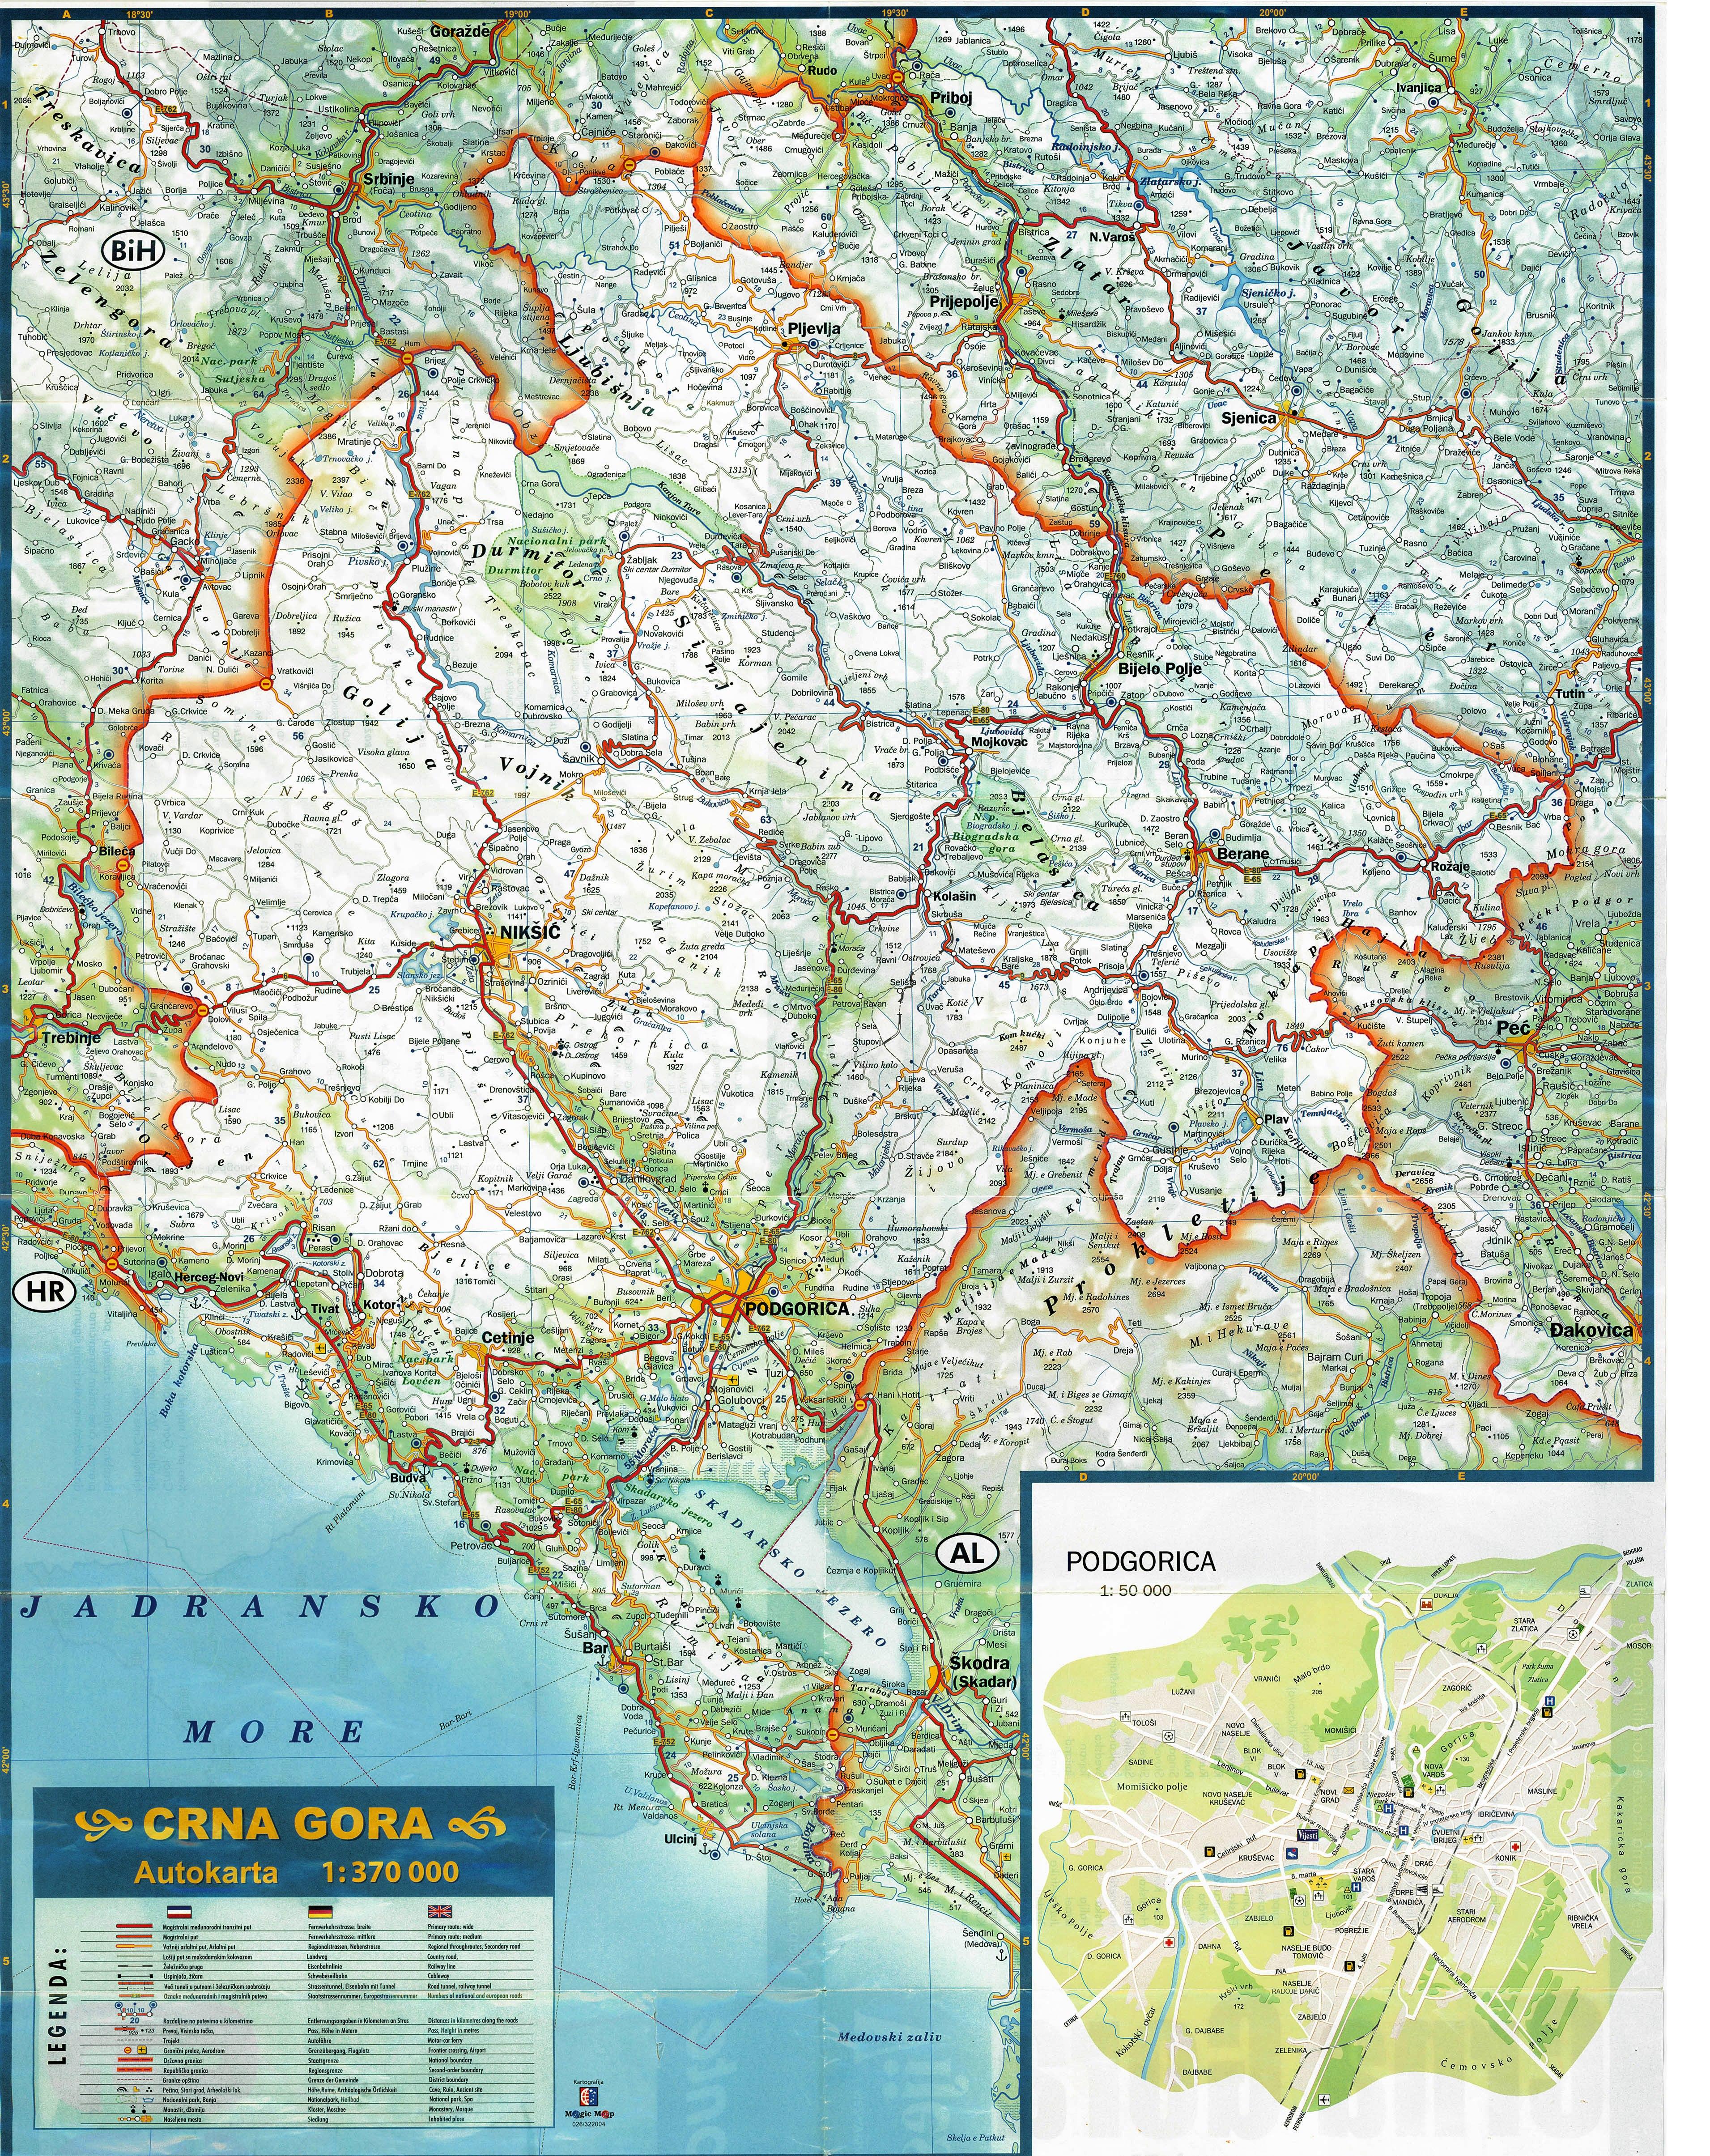 auto karta crne gore Visit Montenegro   Adria Line DMC auto karta crne gore